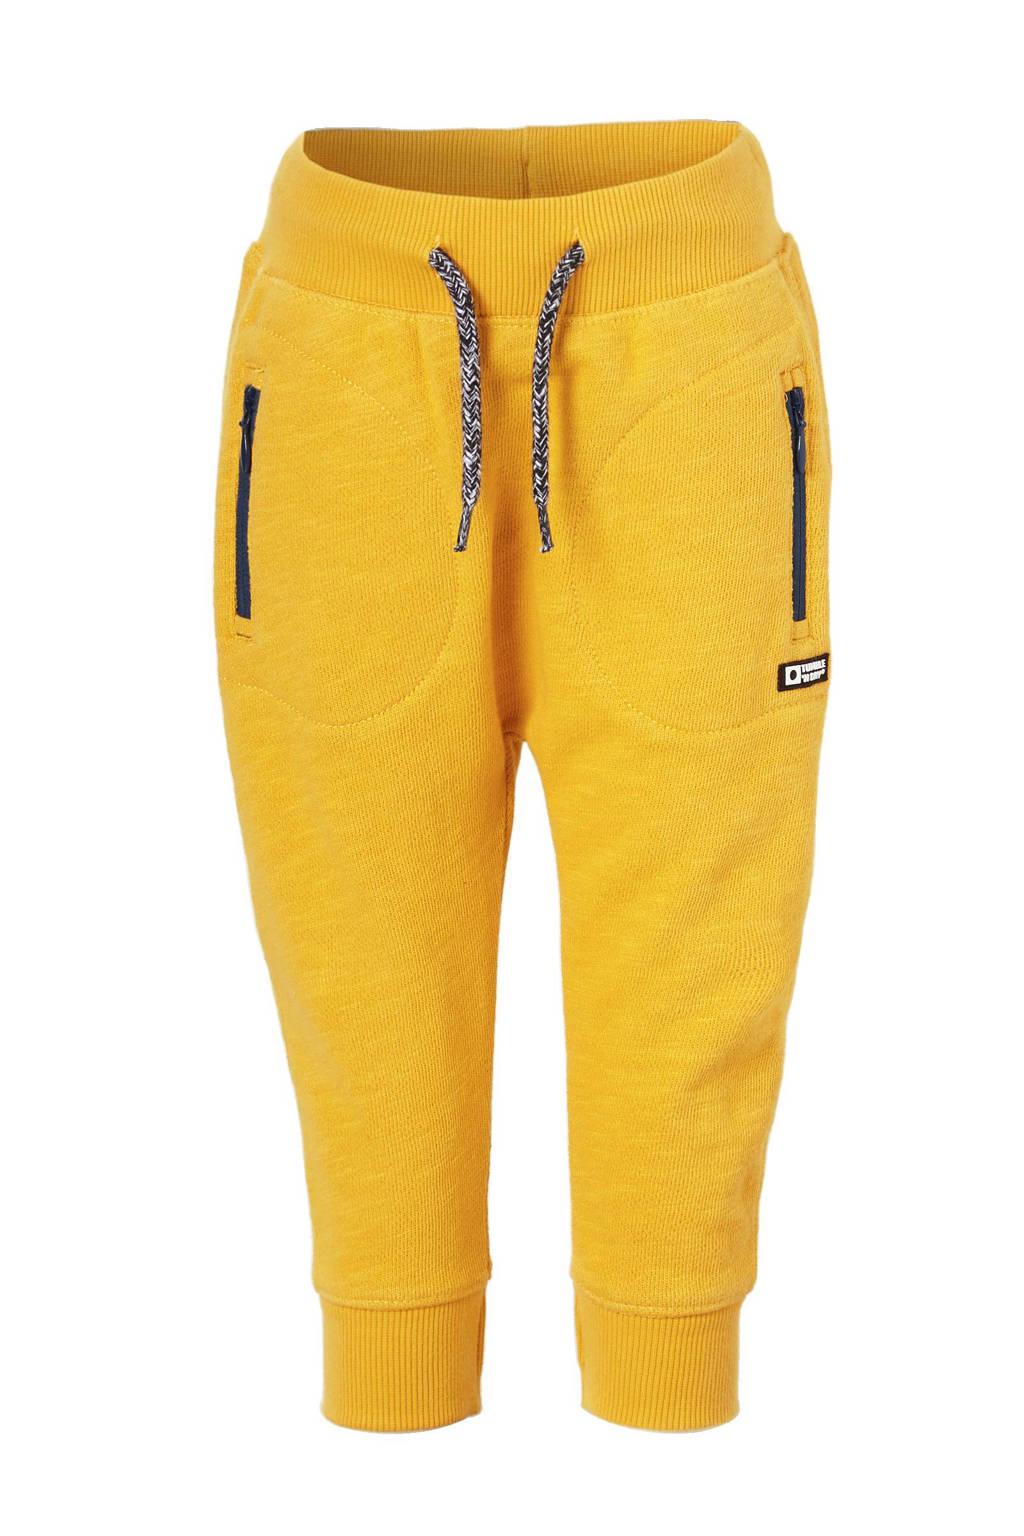 Tumble 'n Dry Zero   sweatpants Nagib geel, Geel/donkerblauw